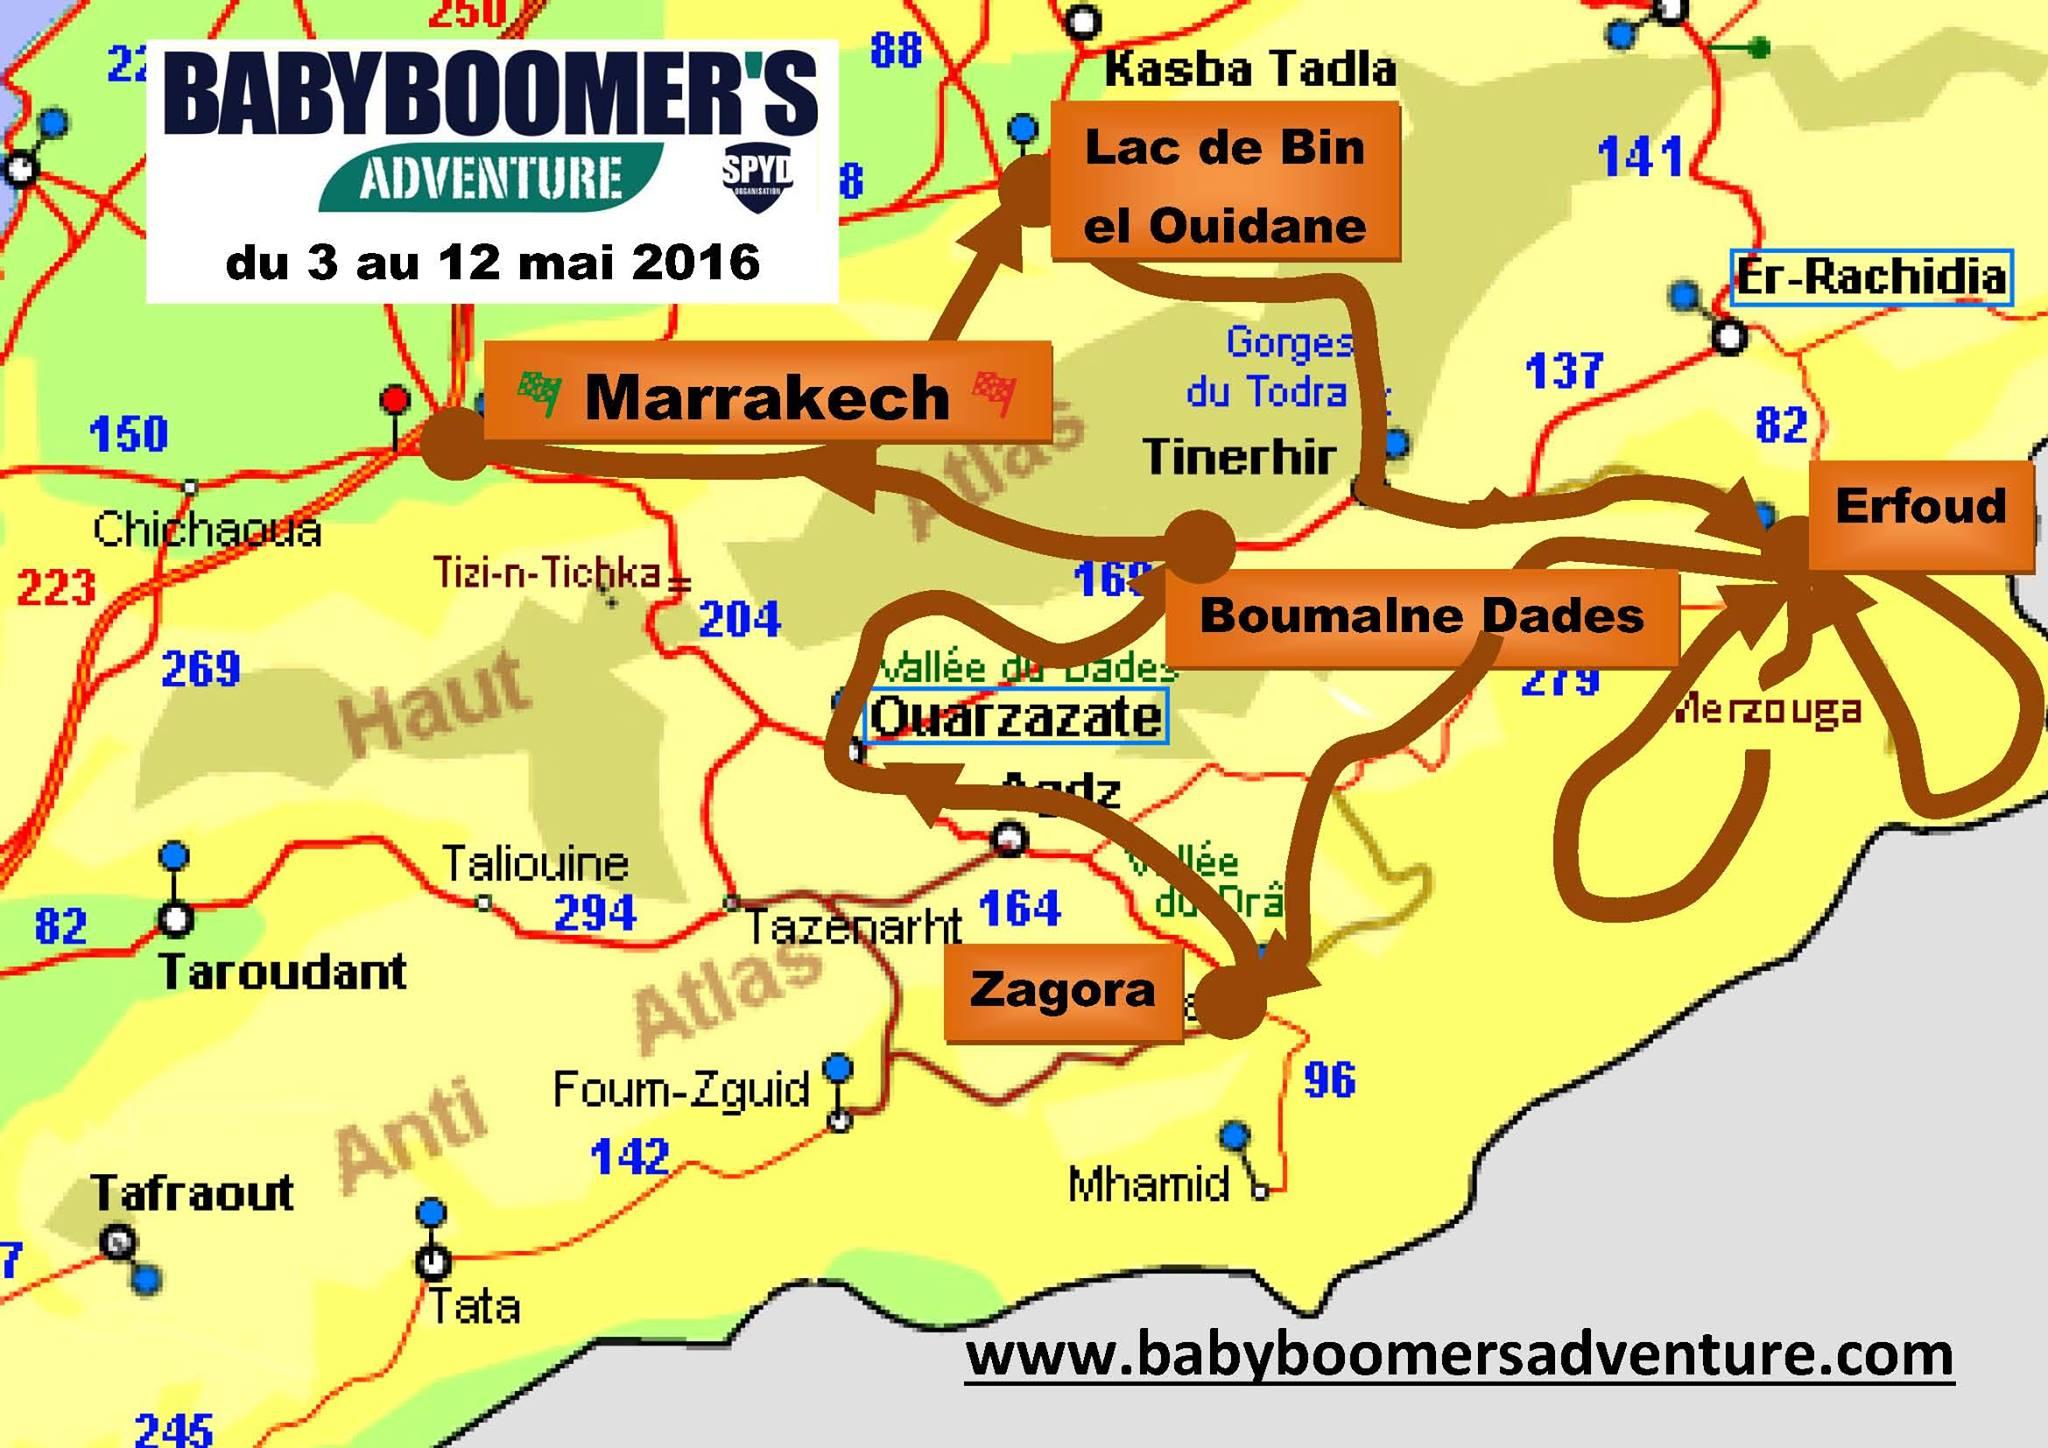 Babyboomer's 2016